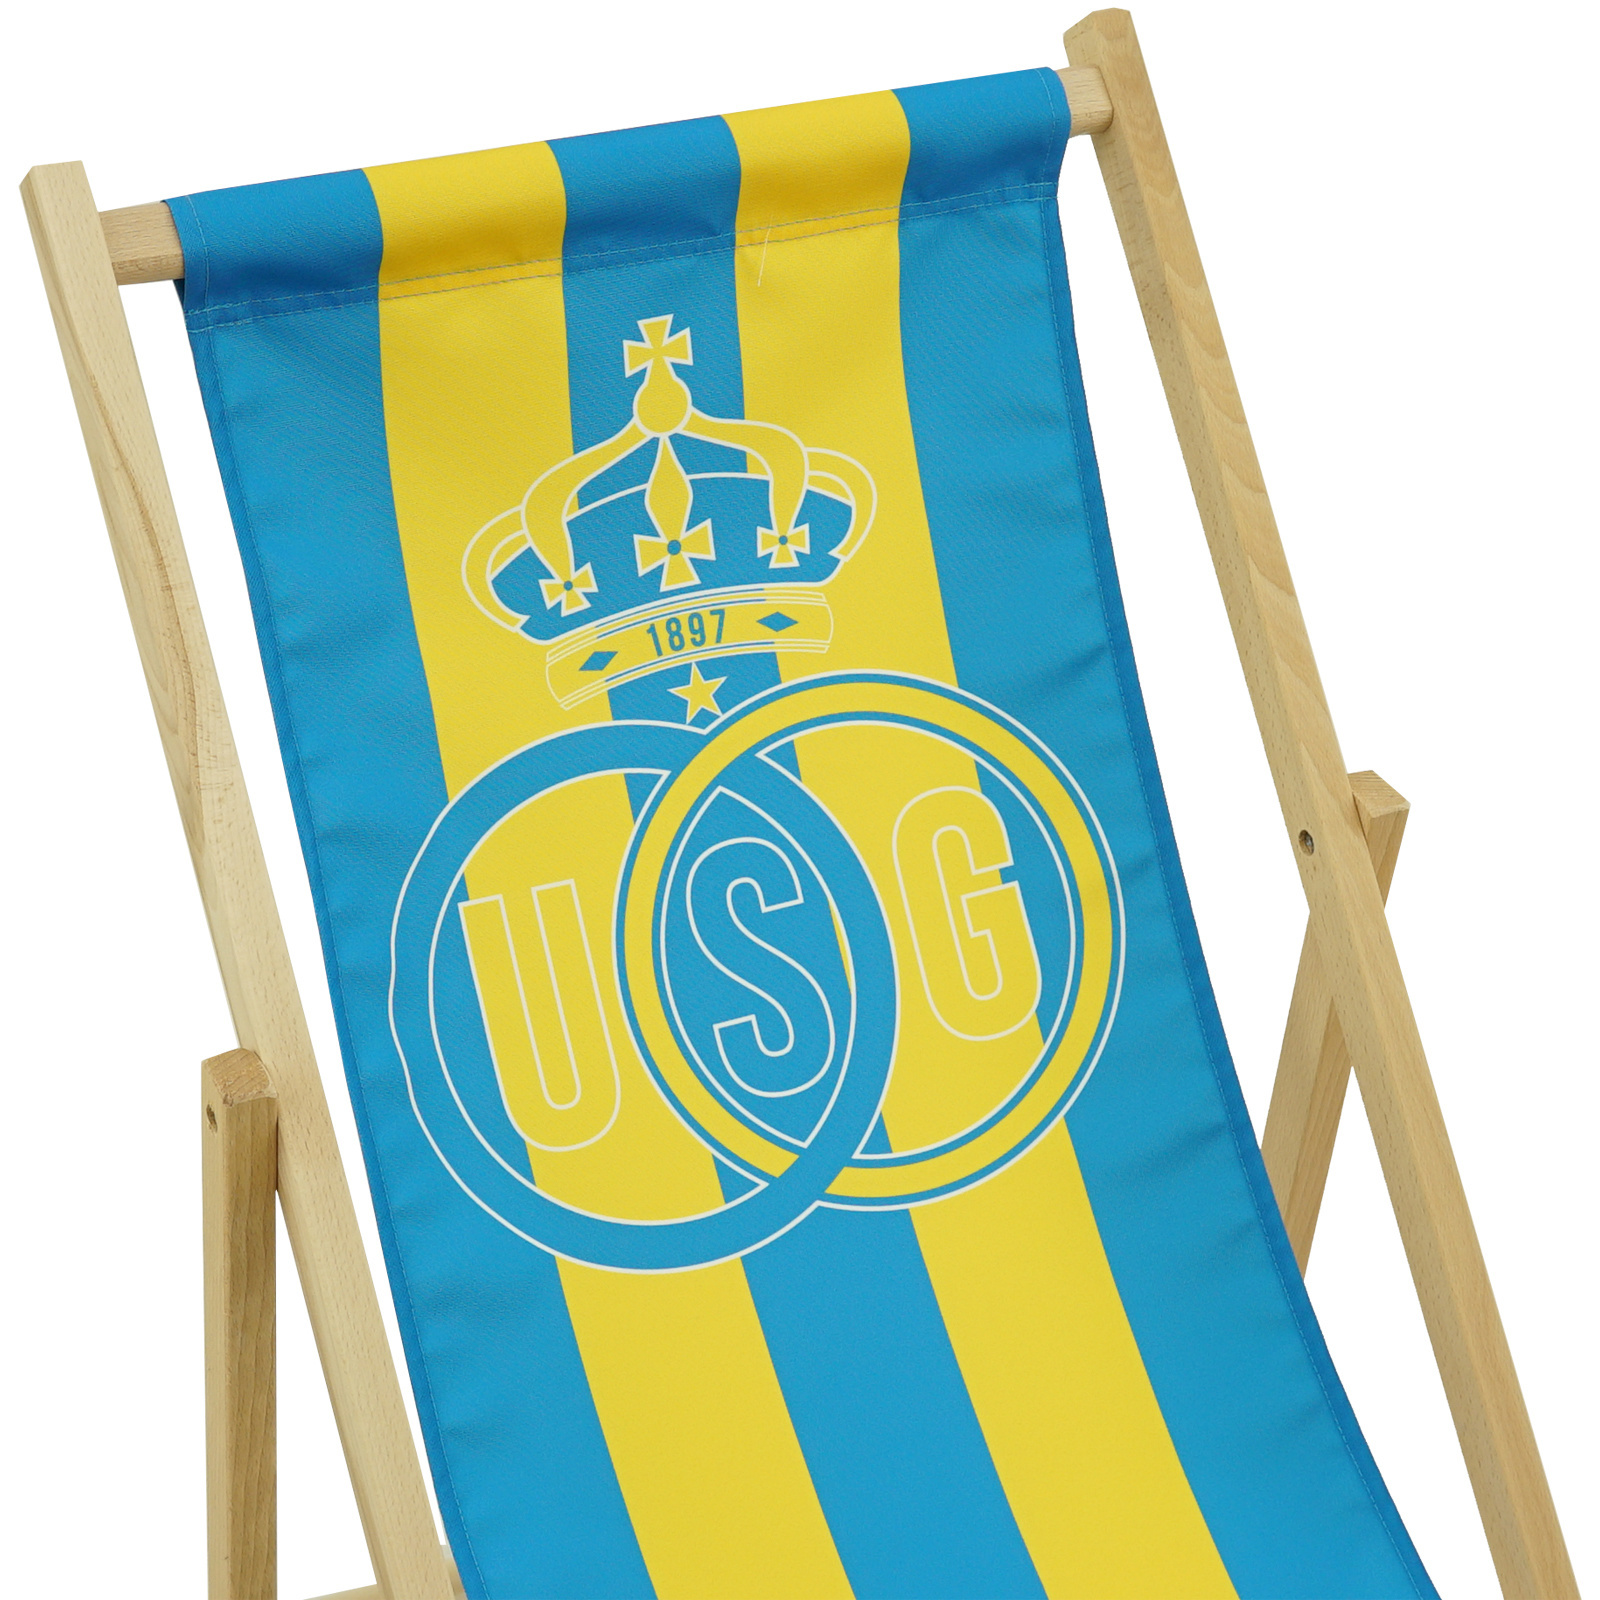 Topfanz Deckchair